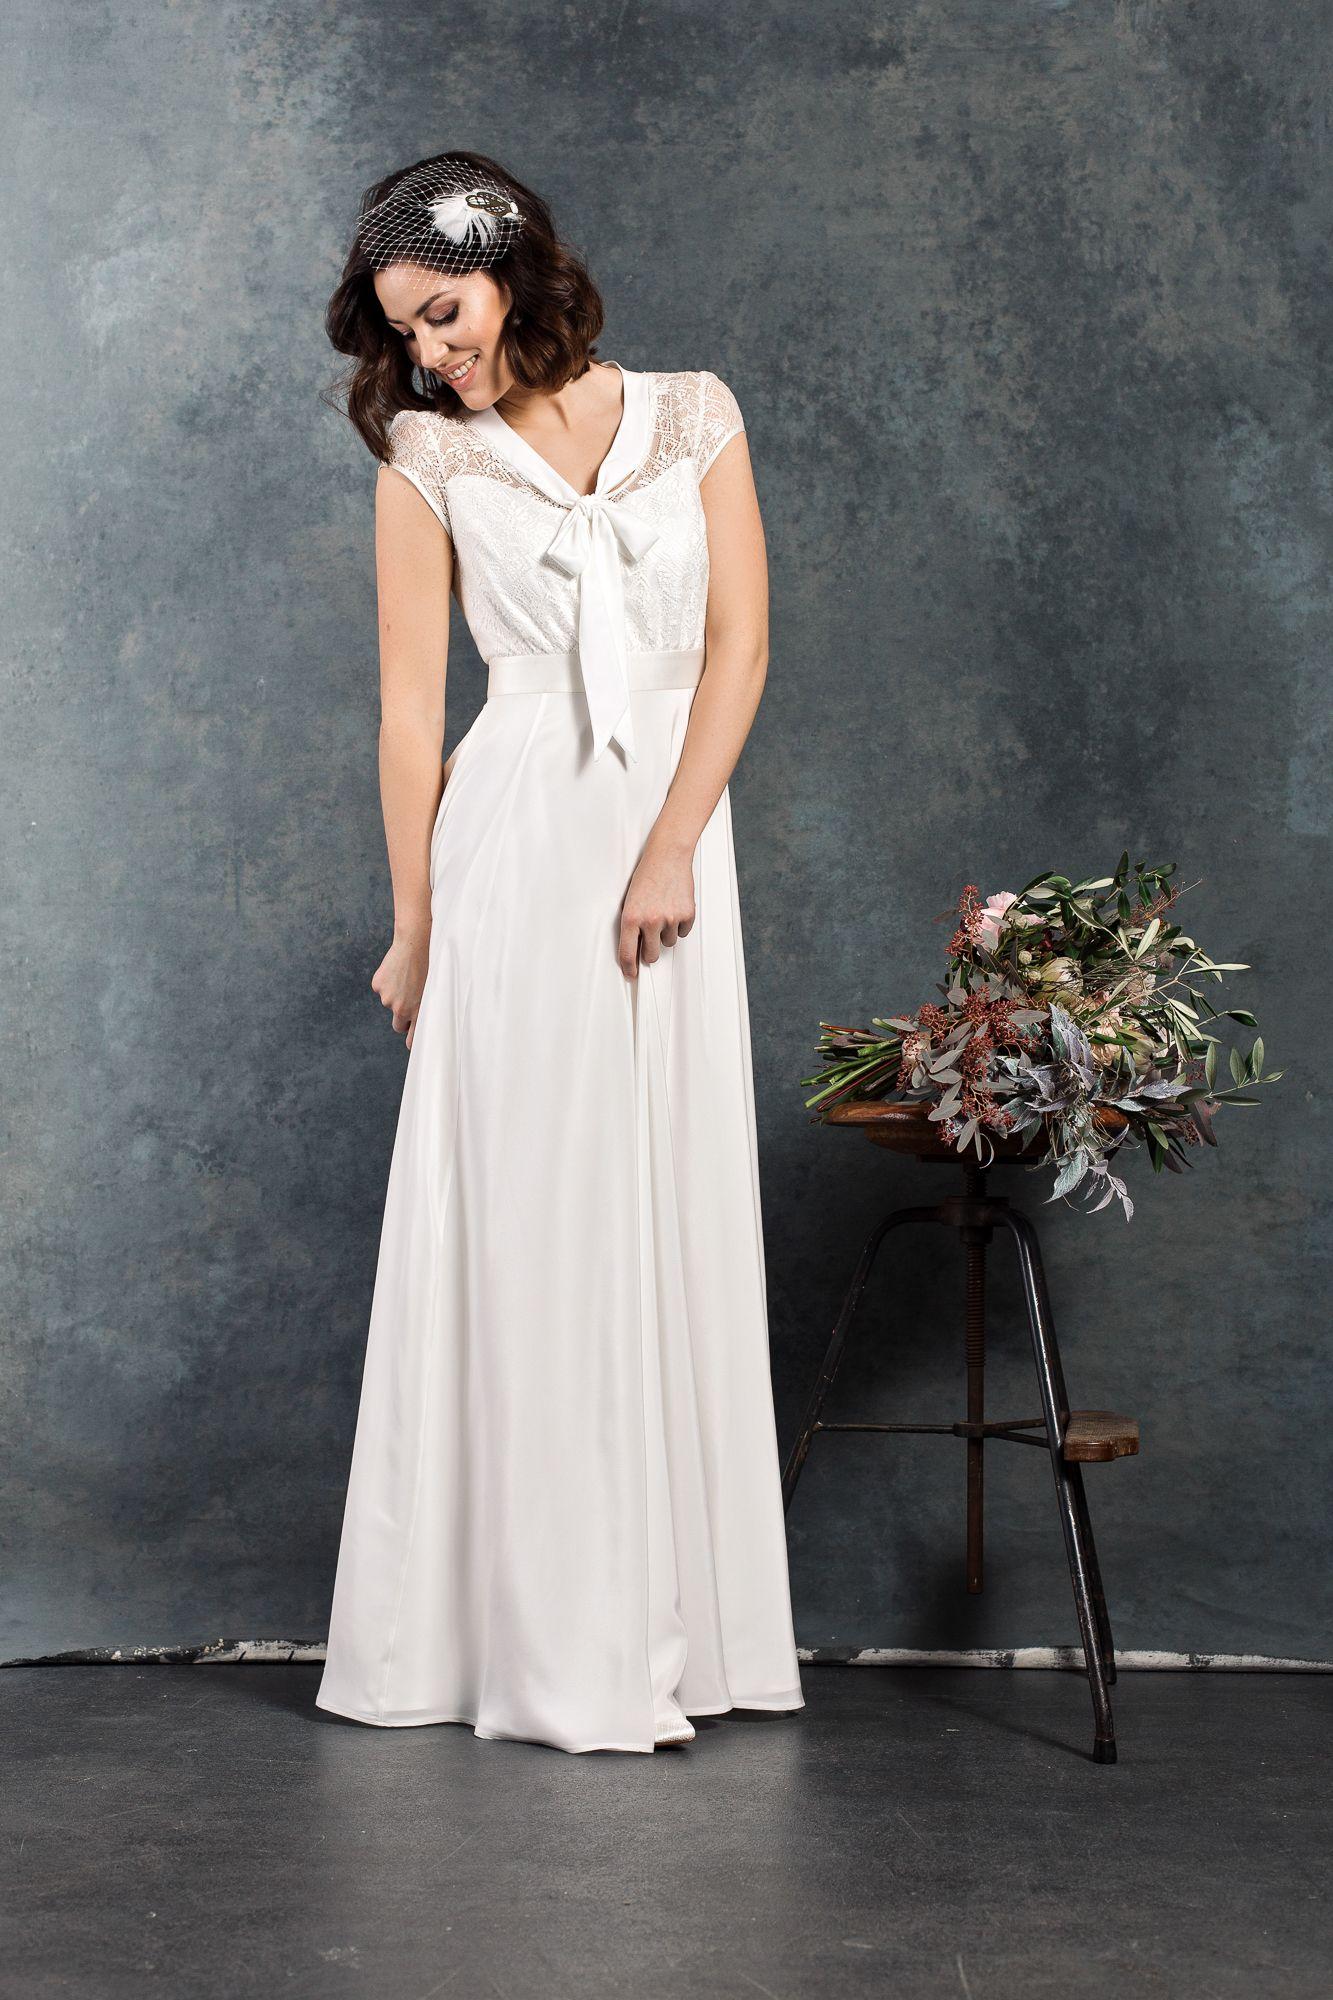 Labude Brautkleid Eveline - Bridal Dress Vintage Style 11s 11er